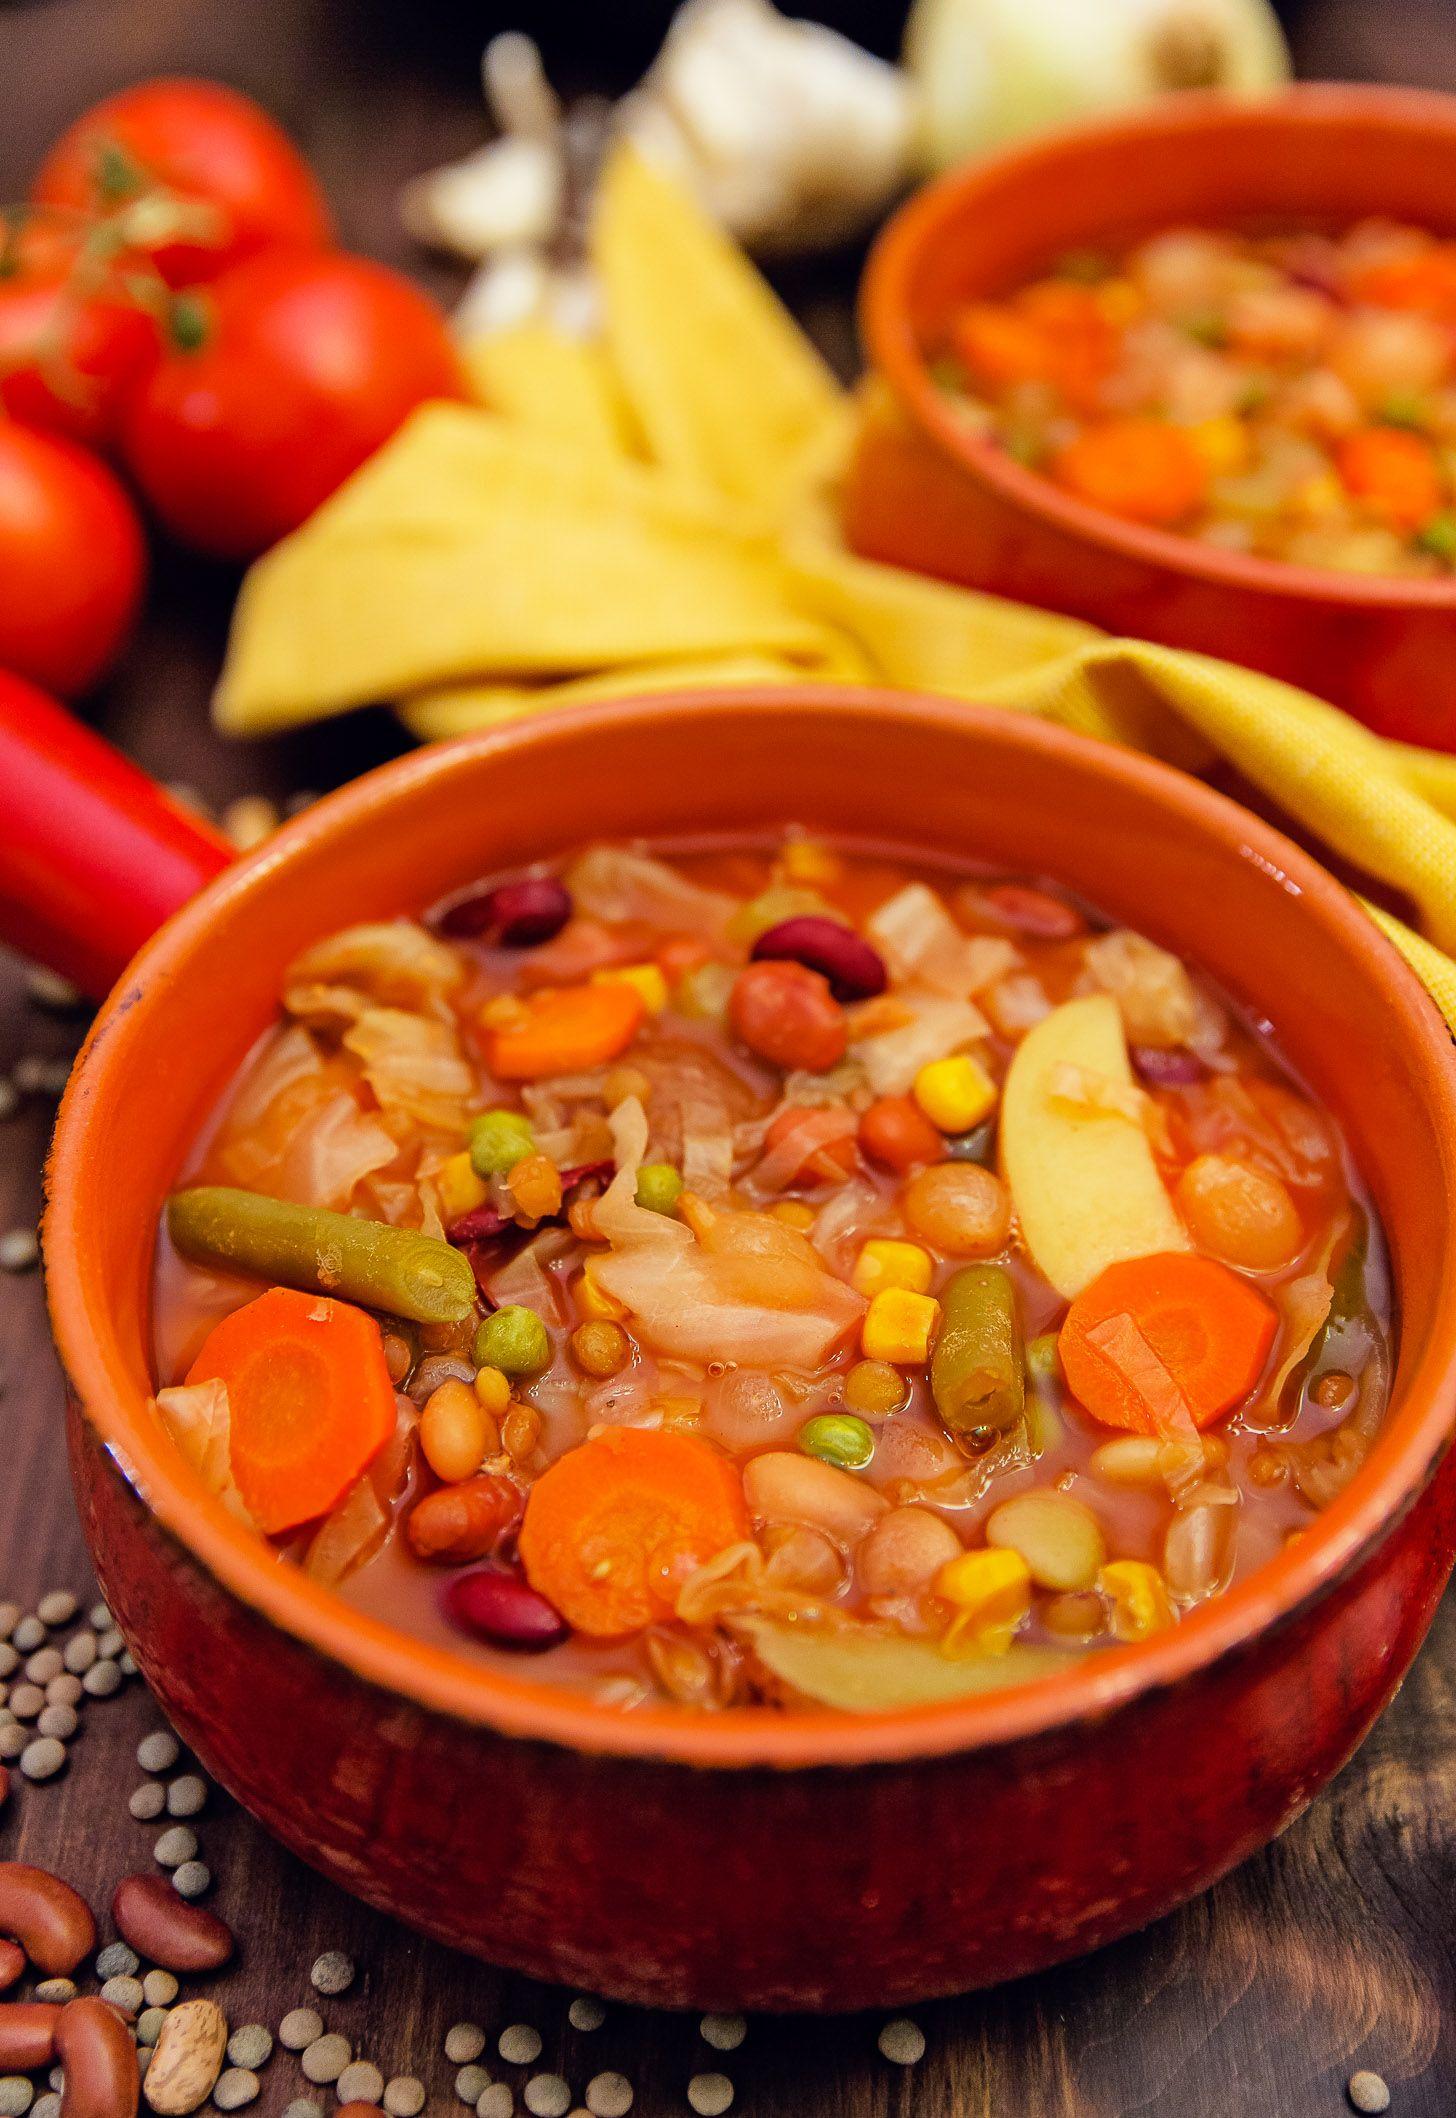 Detox Soup Recipe With Images Vegetable Soup Recipes Detox Soup Food